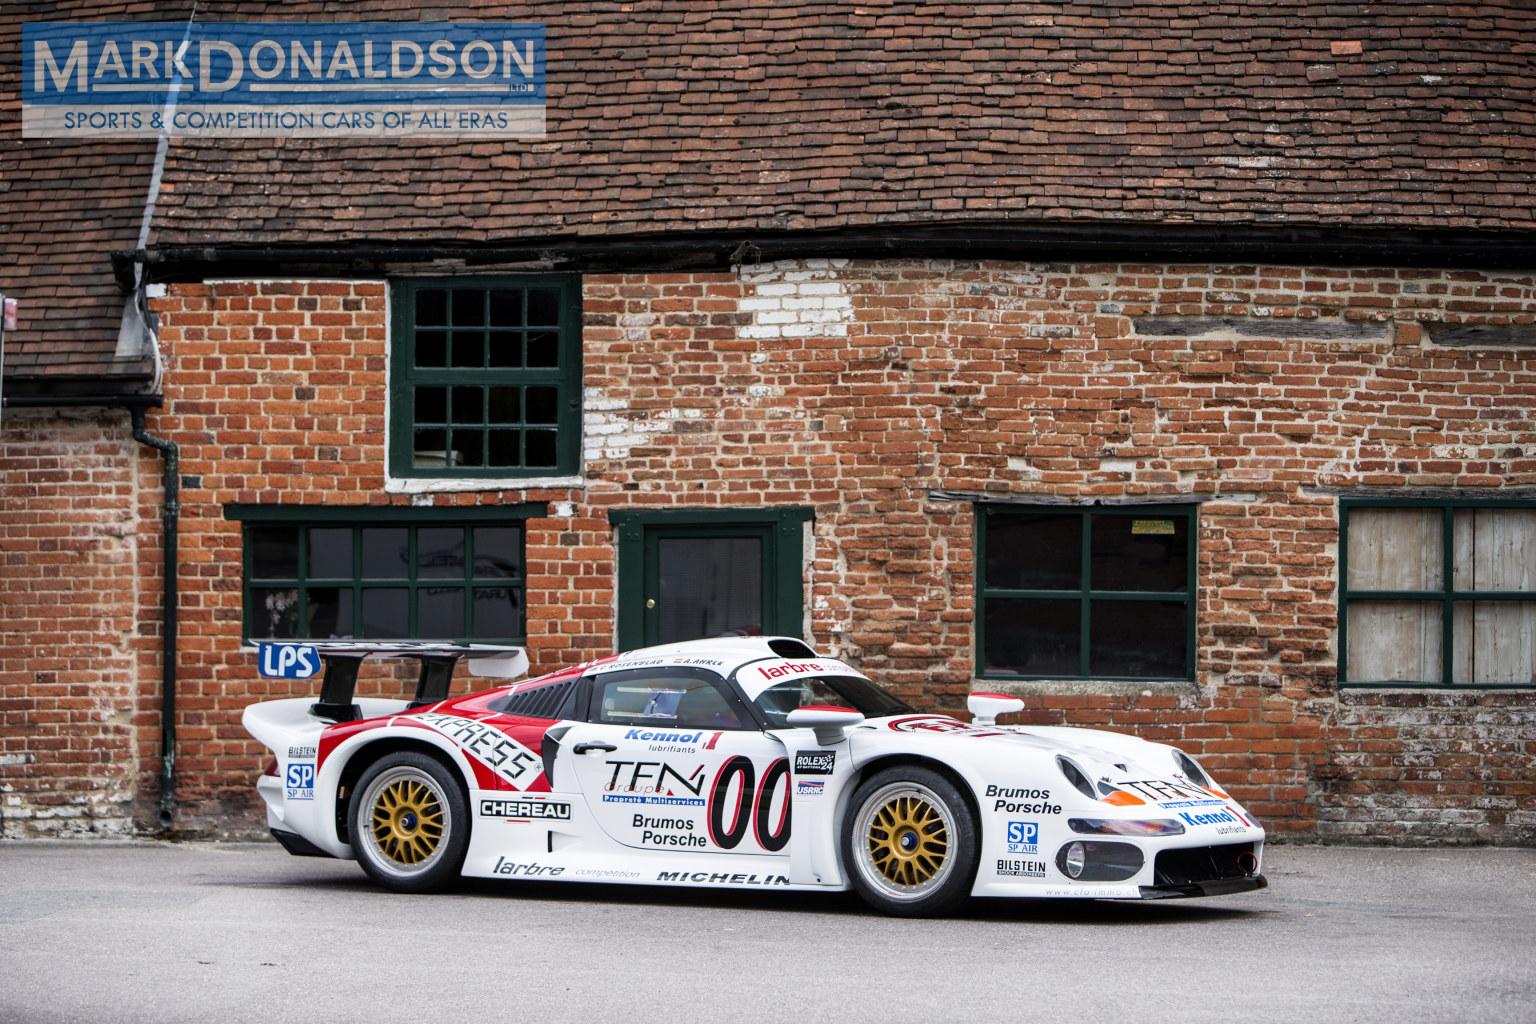 Rare Street Legal Porsche 993 GT1 for Sale